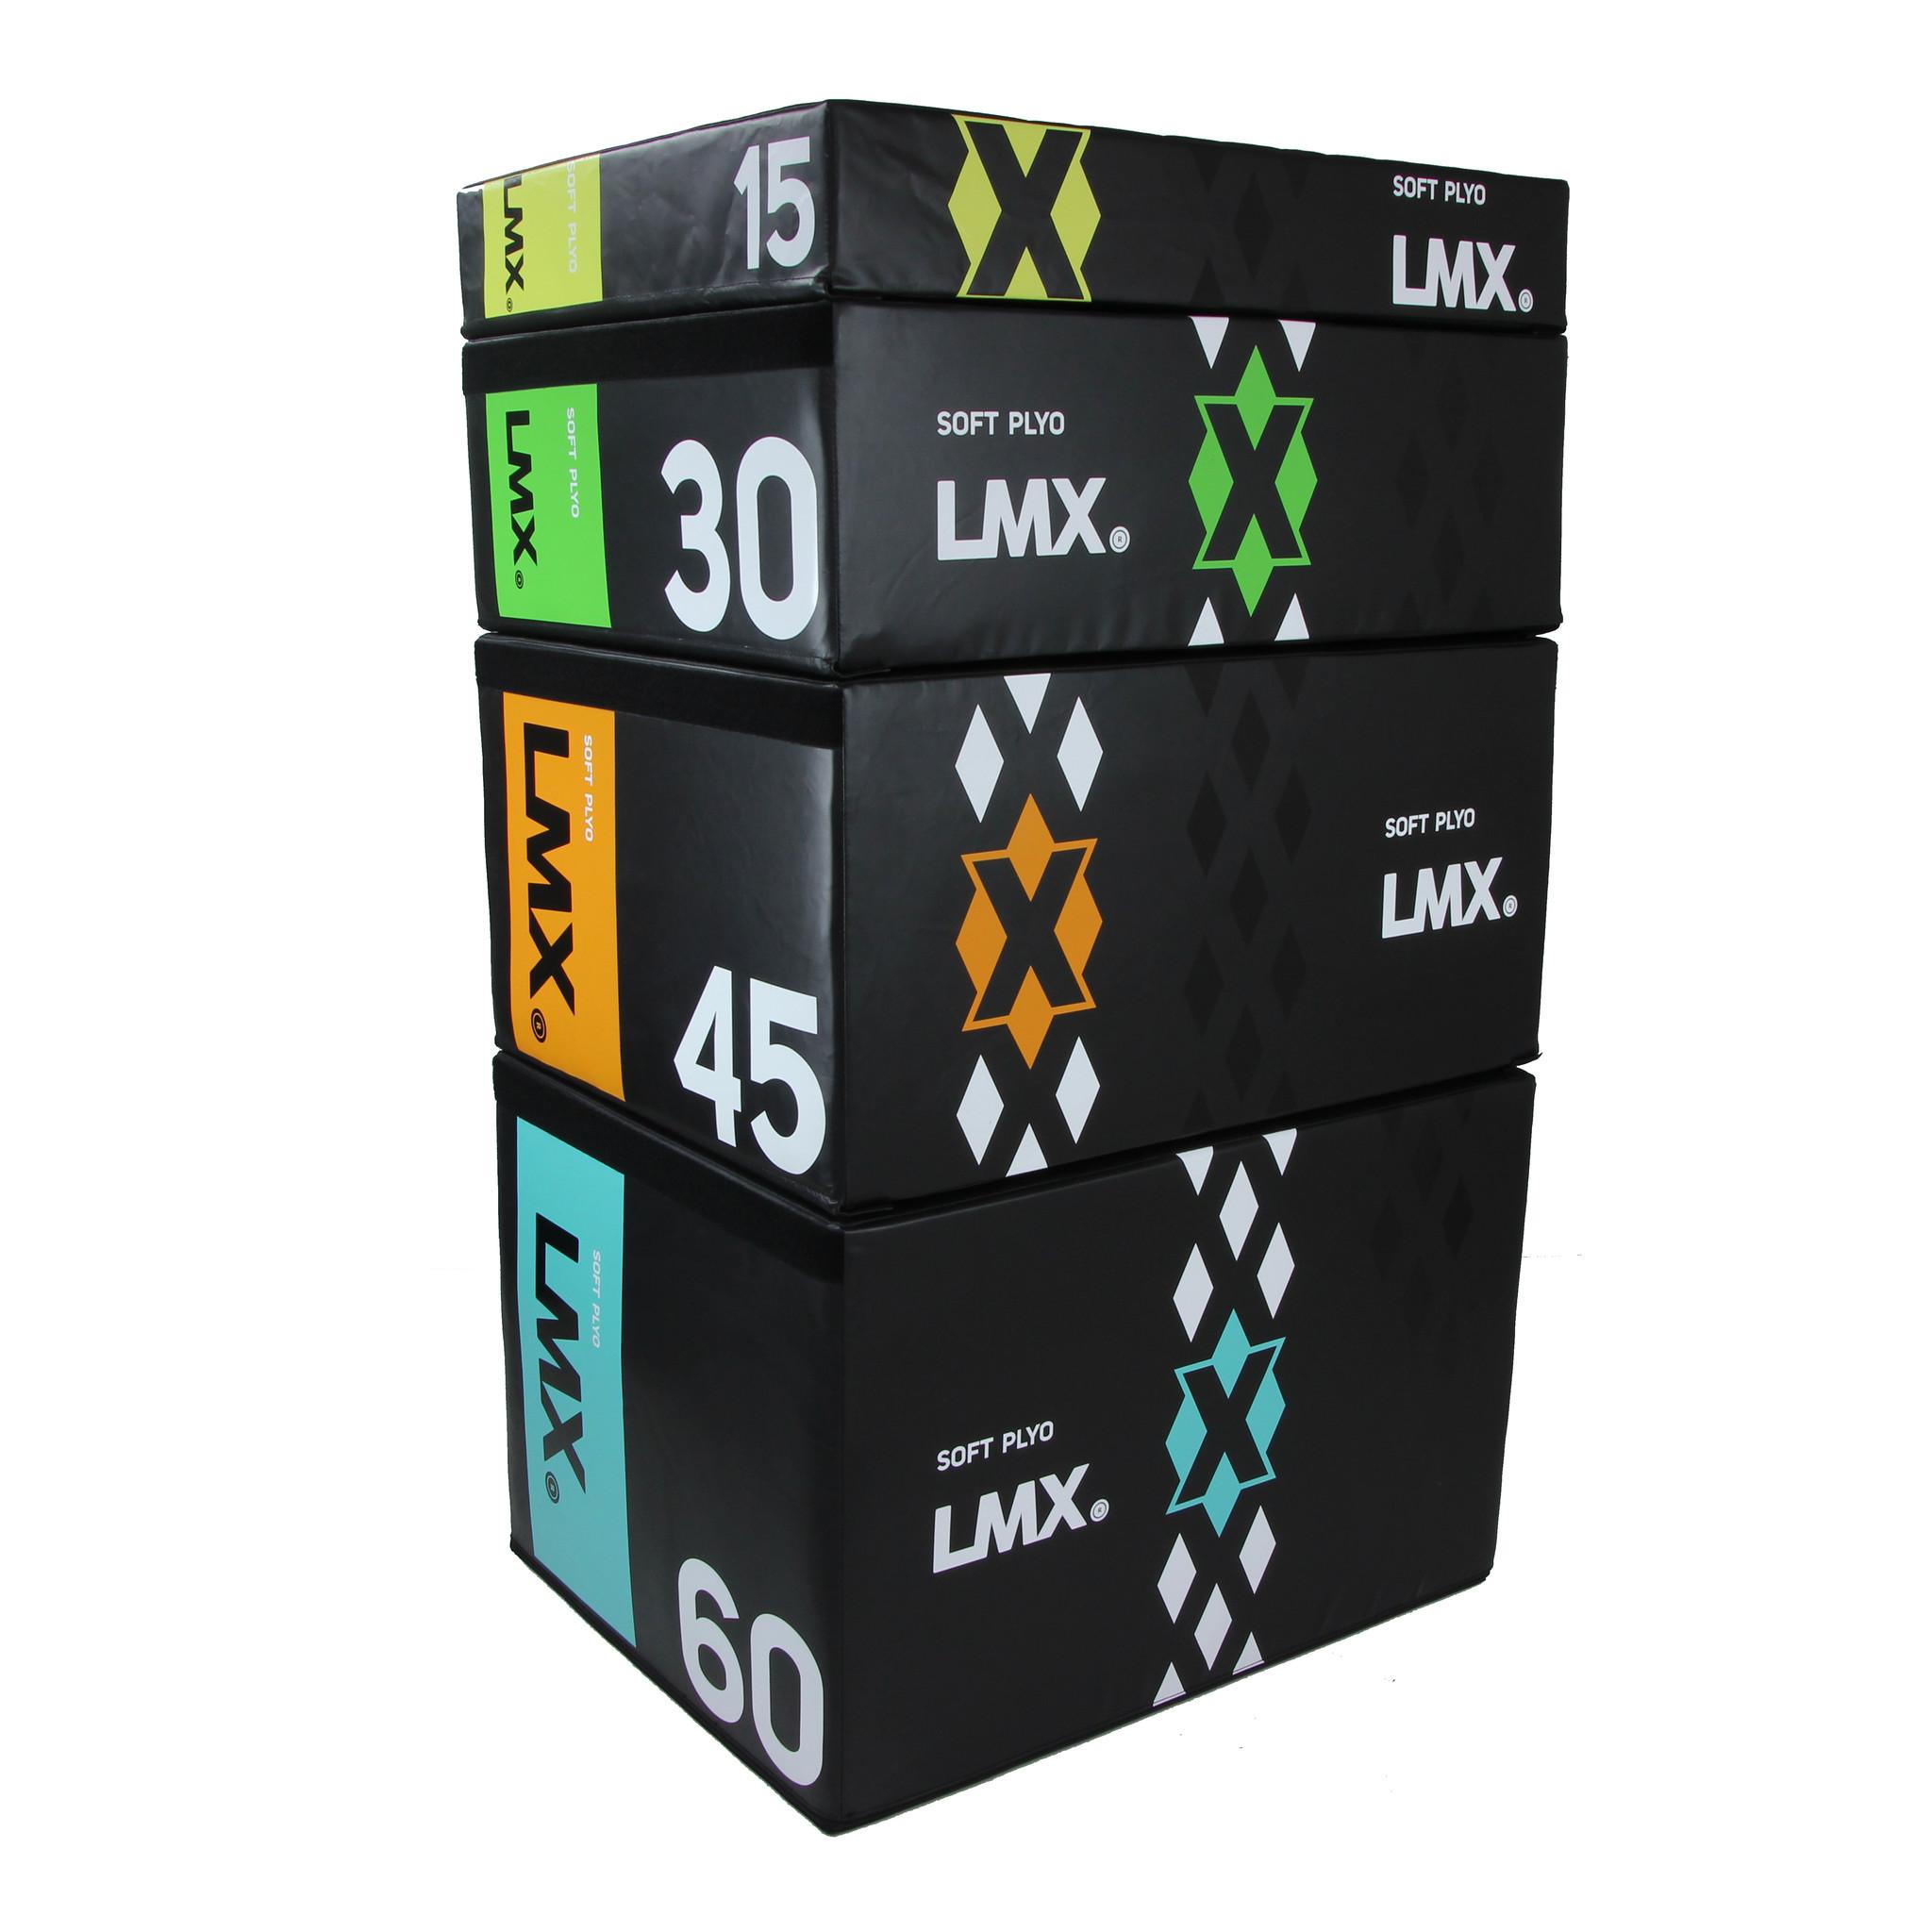 LMX.® LMX1297 LMX. Soft plyo boxes (15 - 60cm)